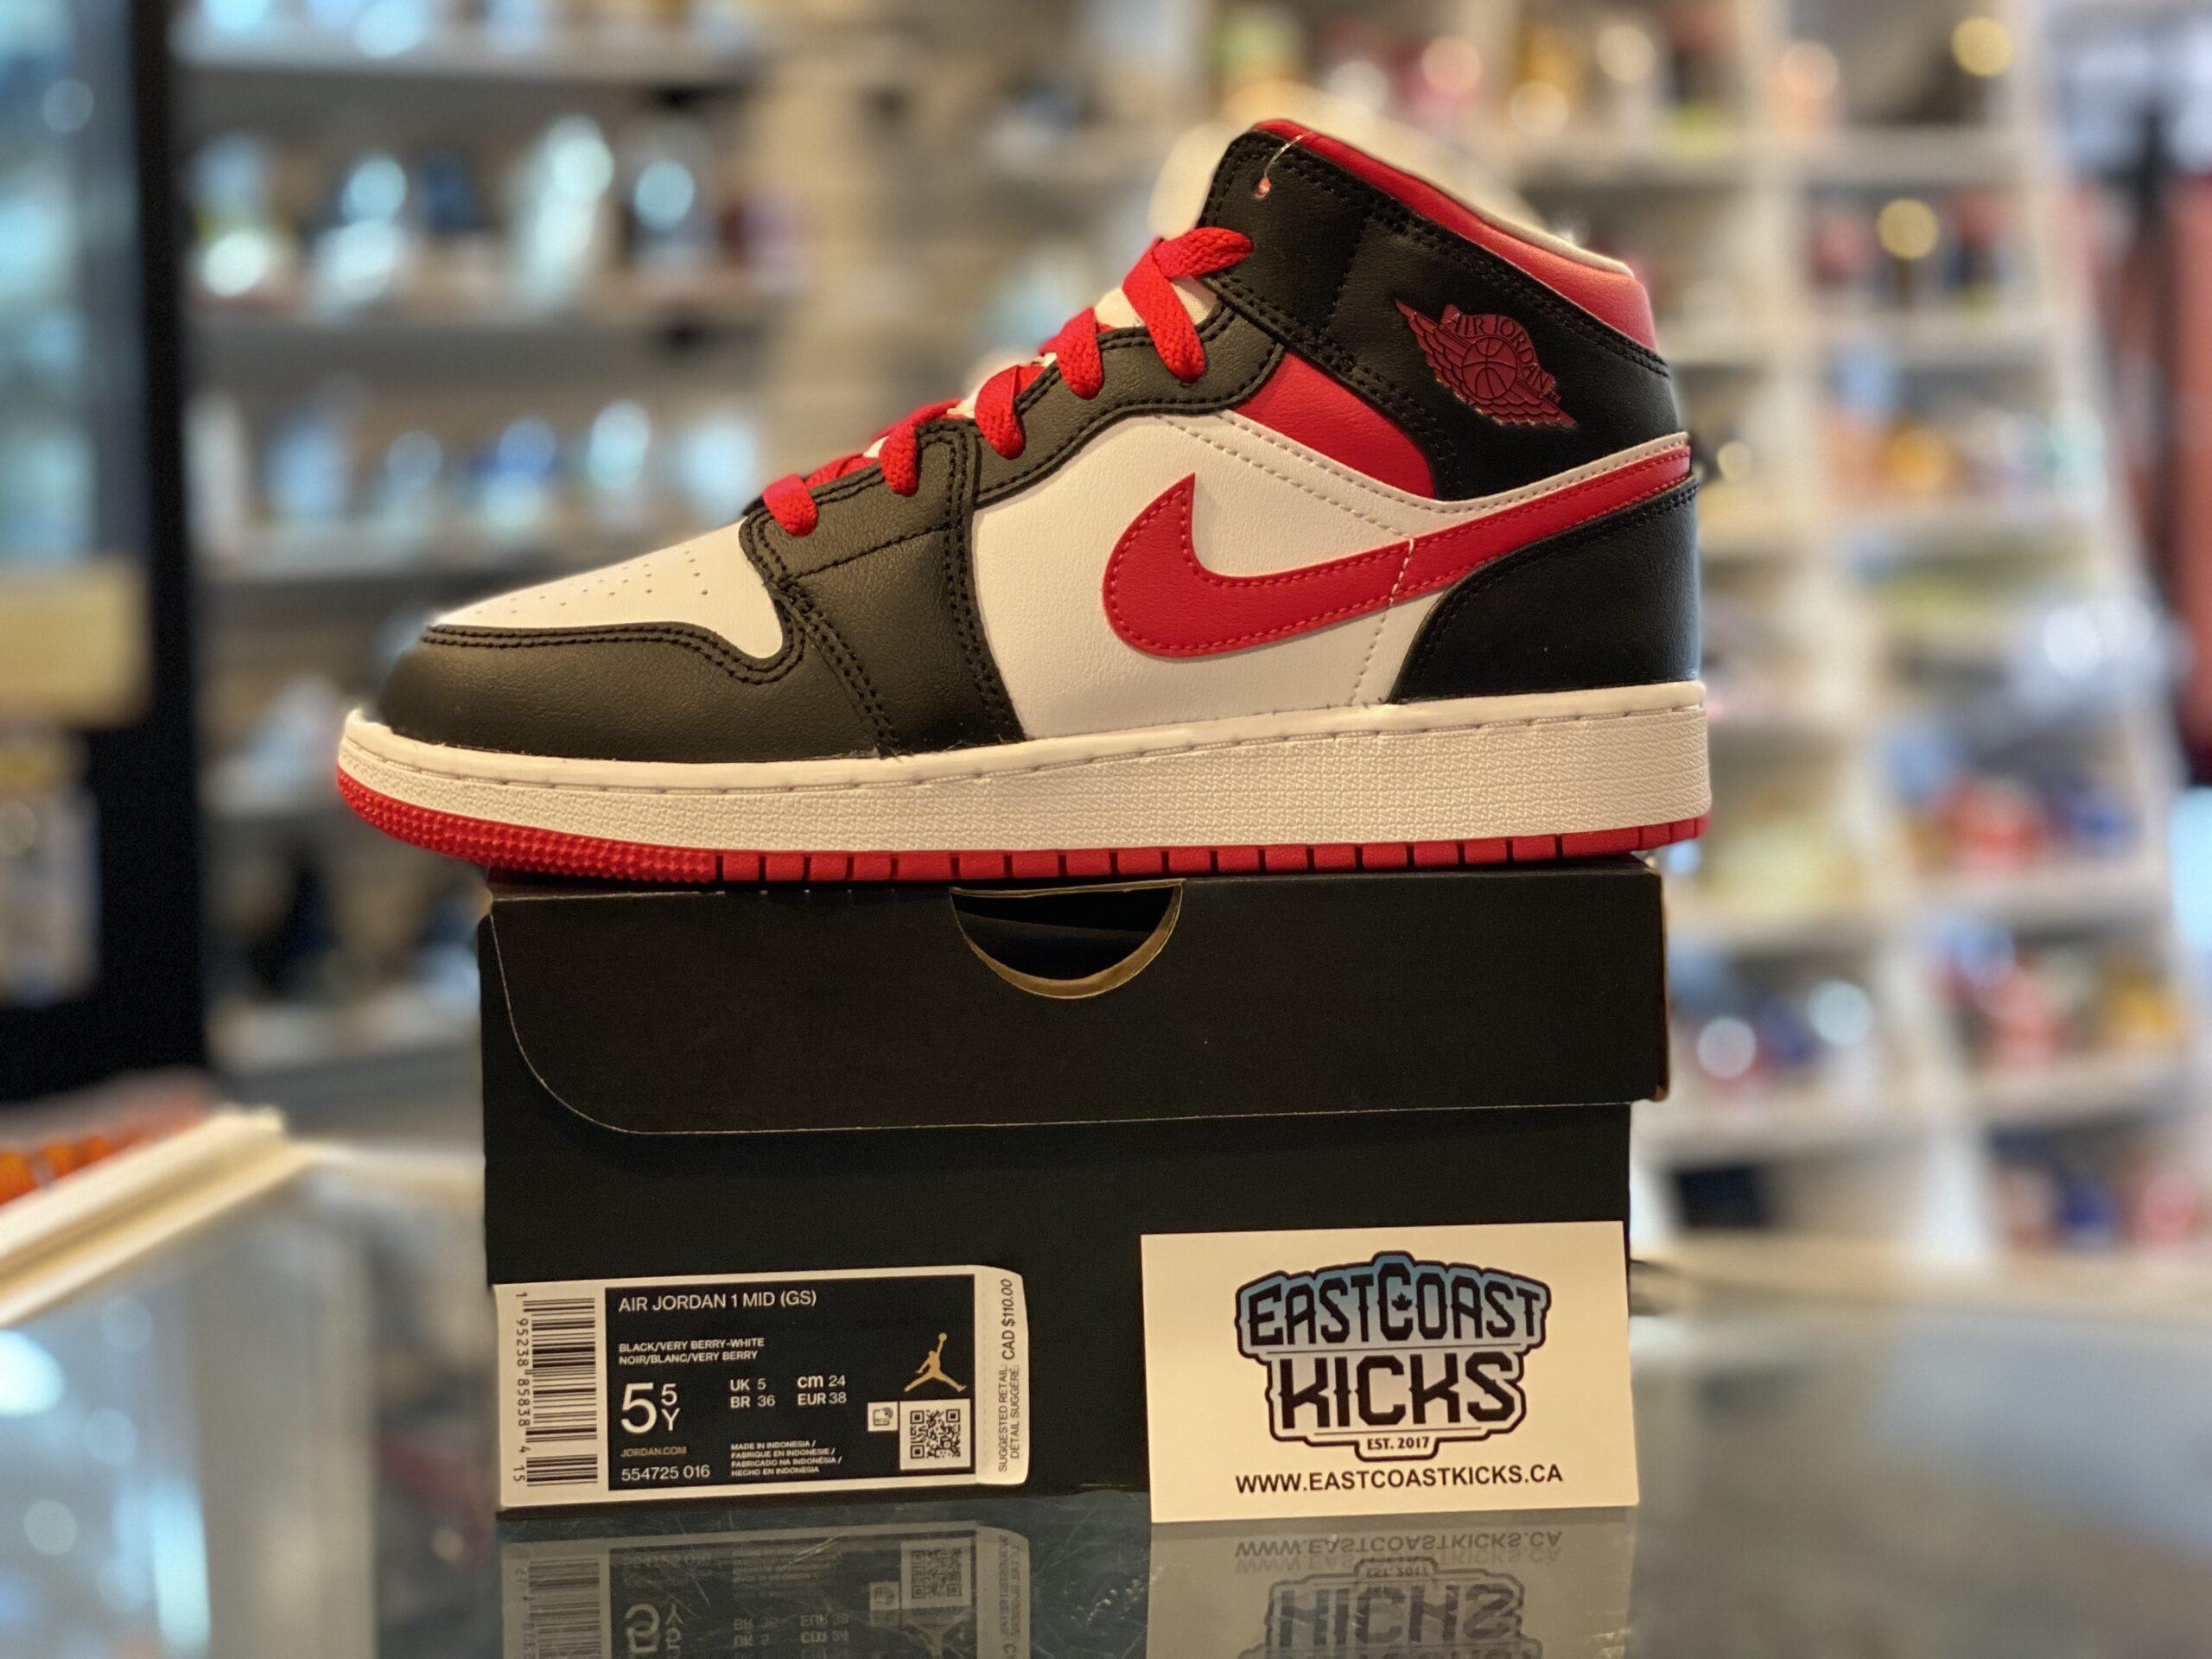 Jordan 1 Mid Very Berry Size 5.5Y